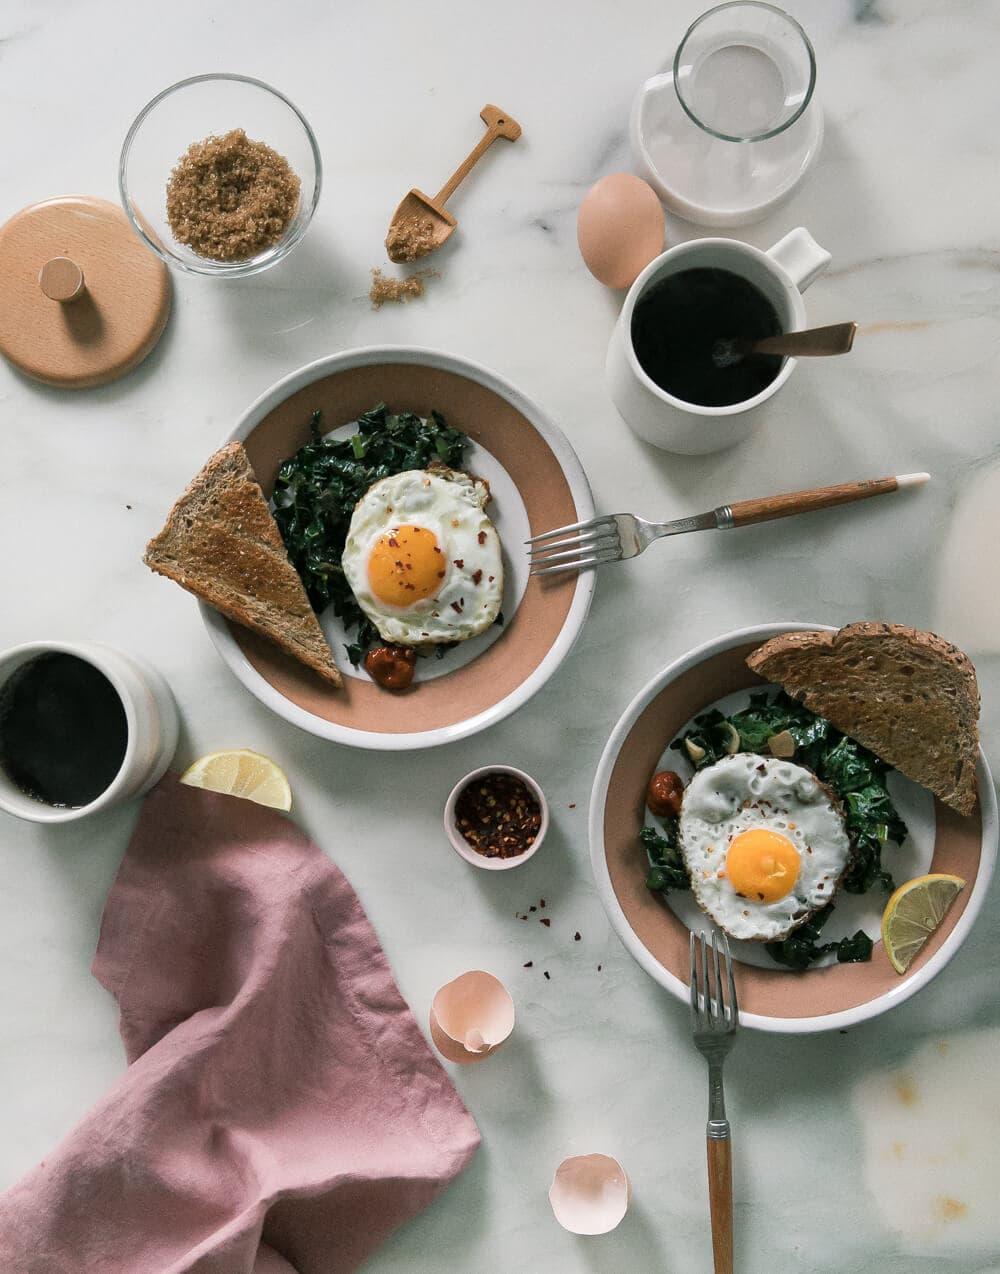 Olive Oil Fried Eggs